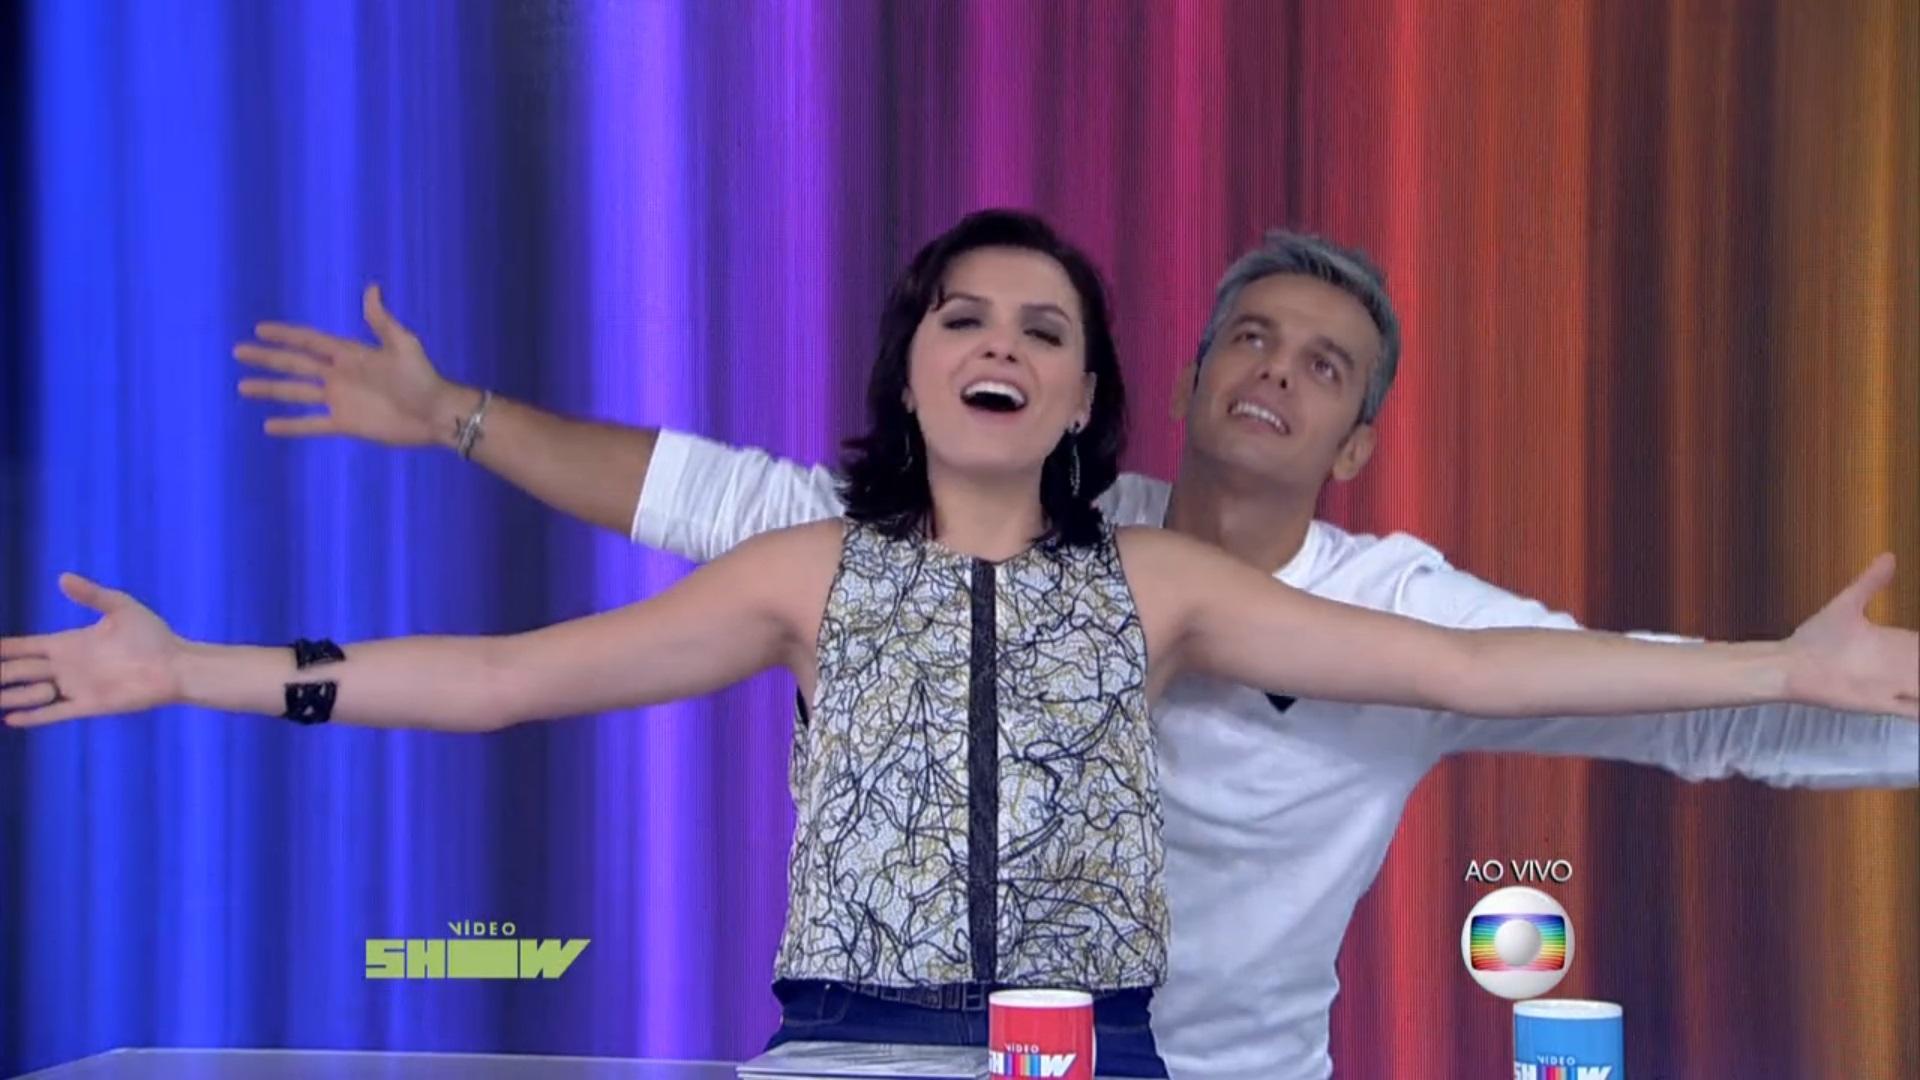 monica e otaviano video show